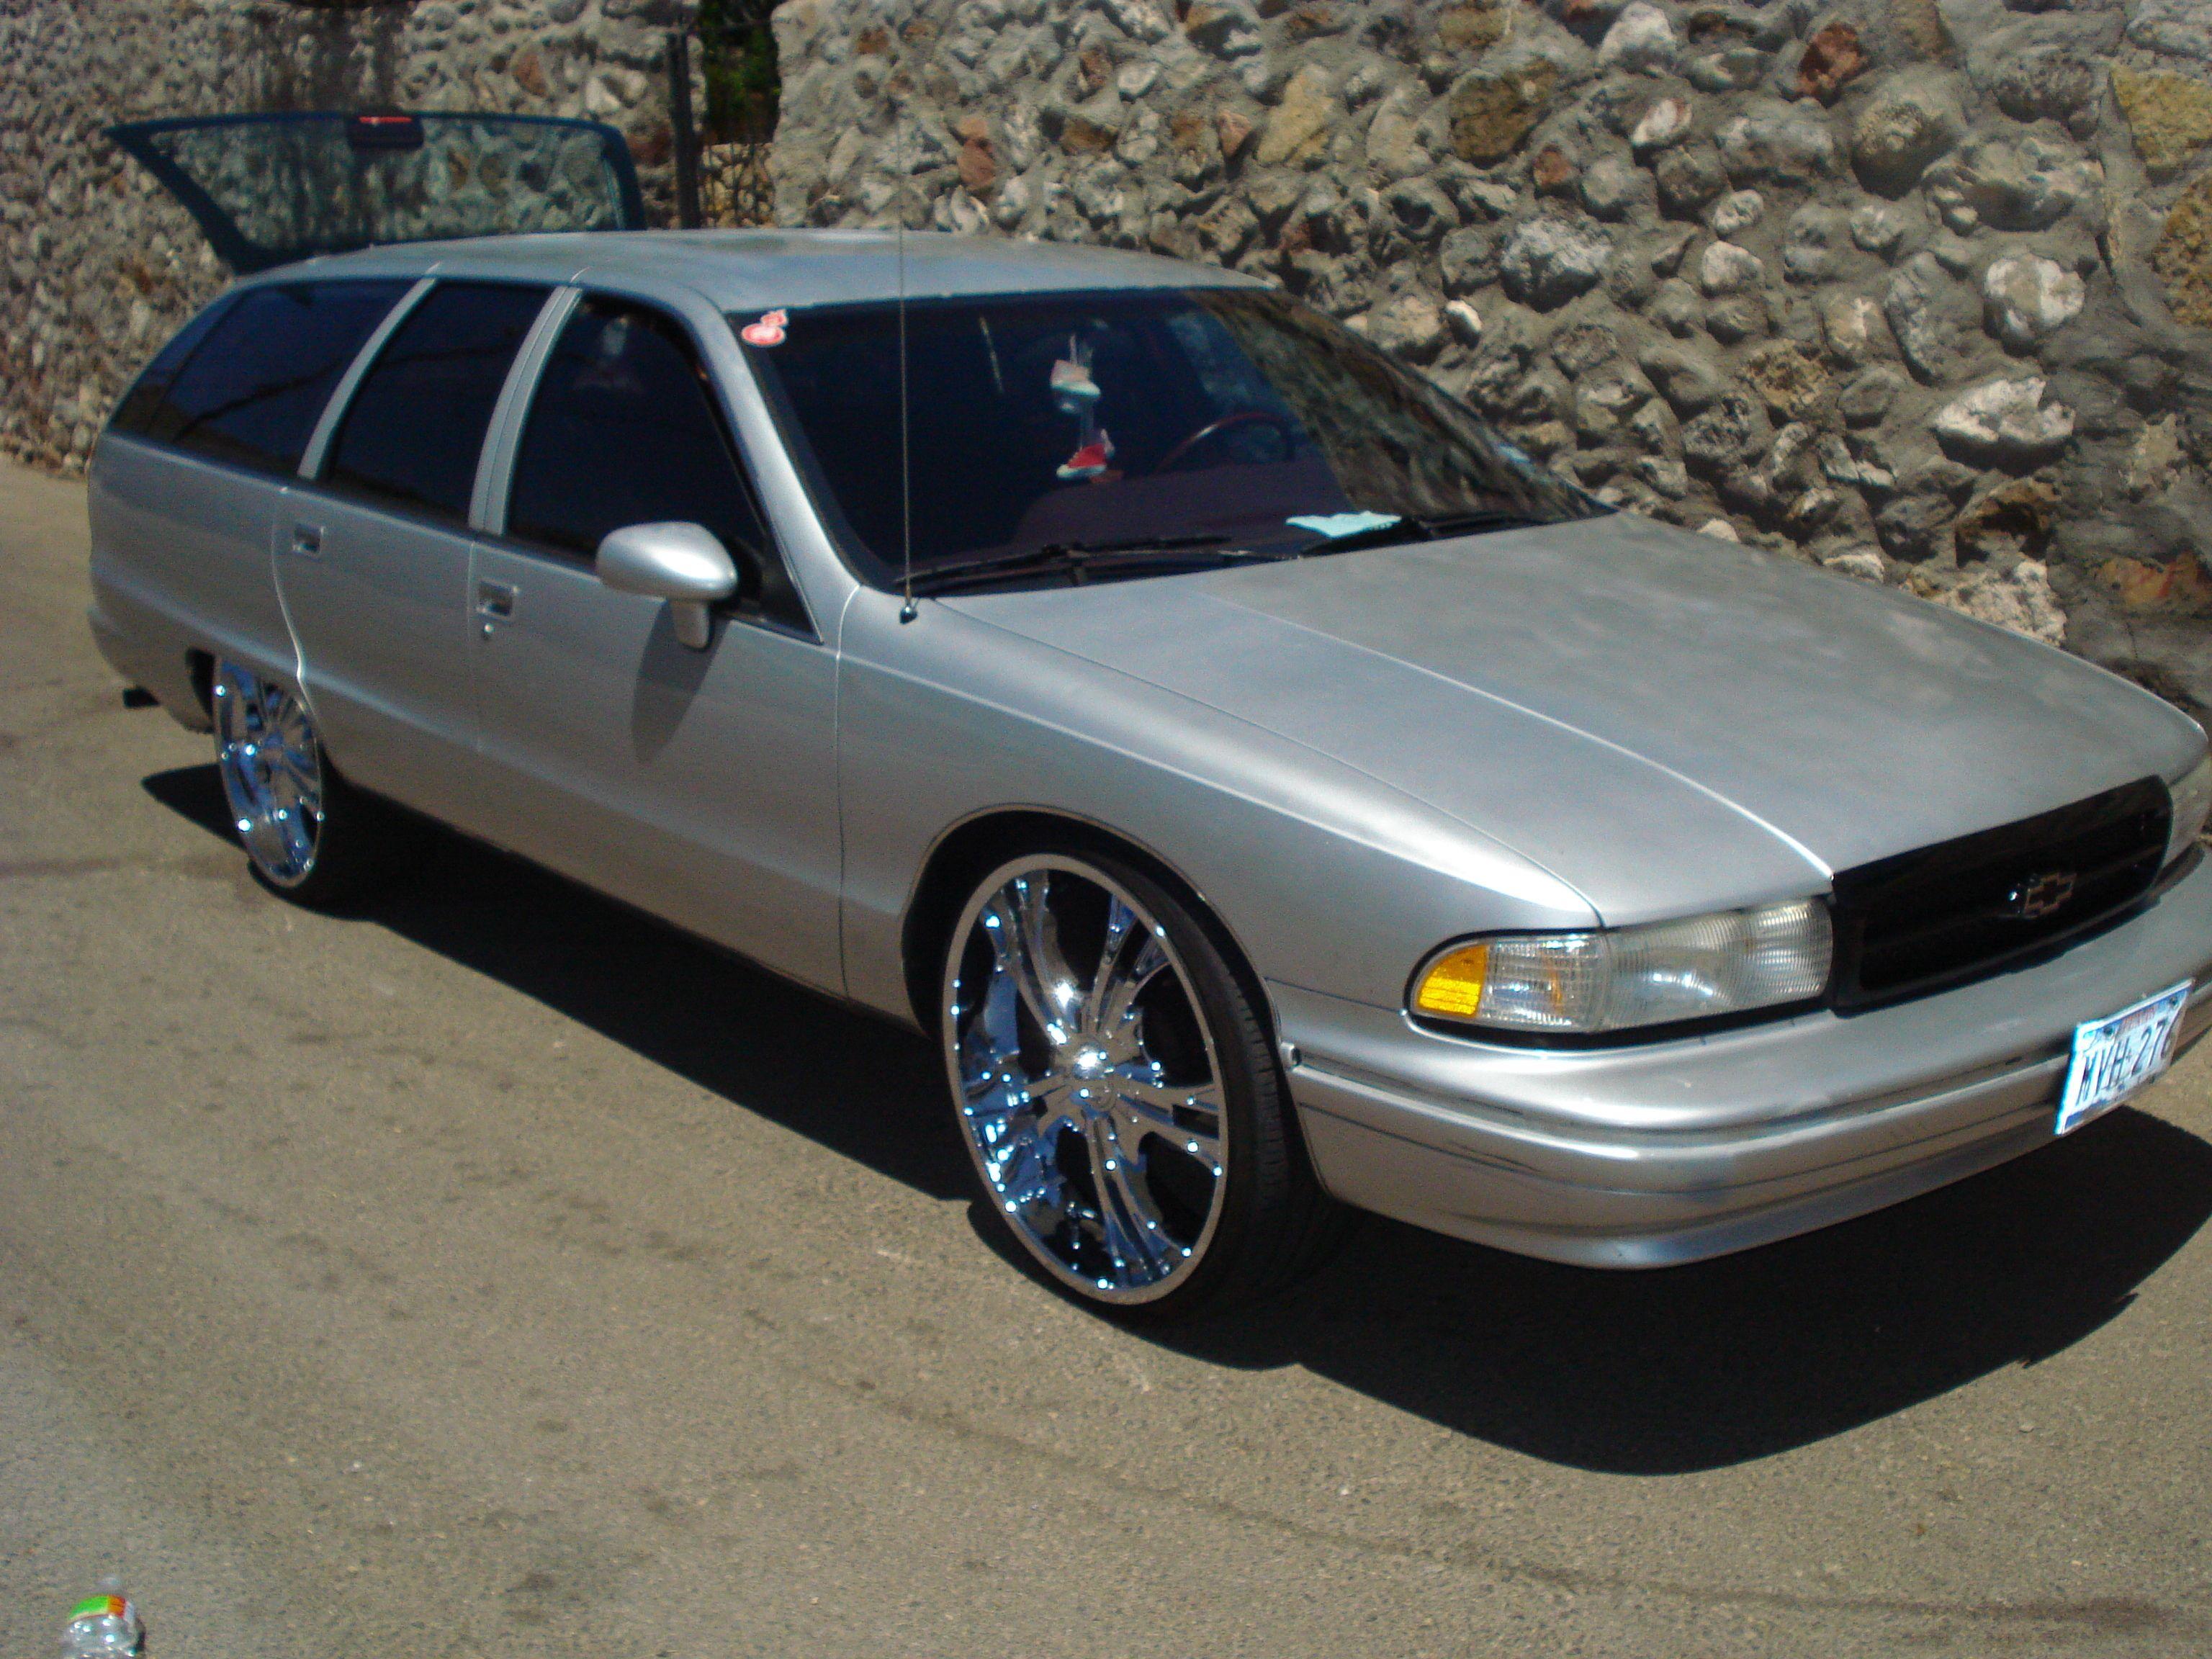 1995 chevy caprice impala ss wagon  [ 3072 x 2304 Pixel ]